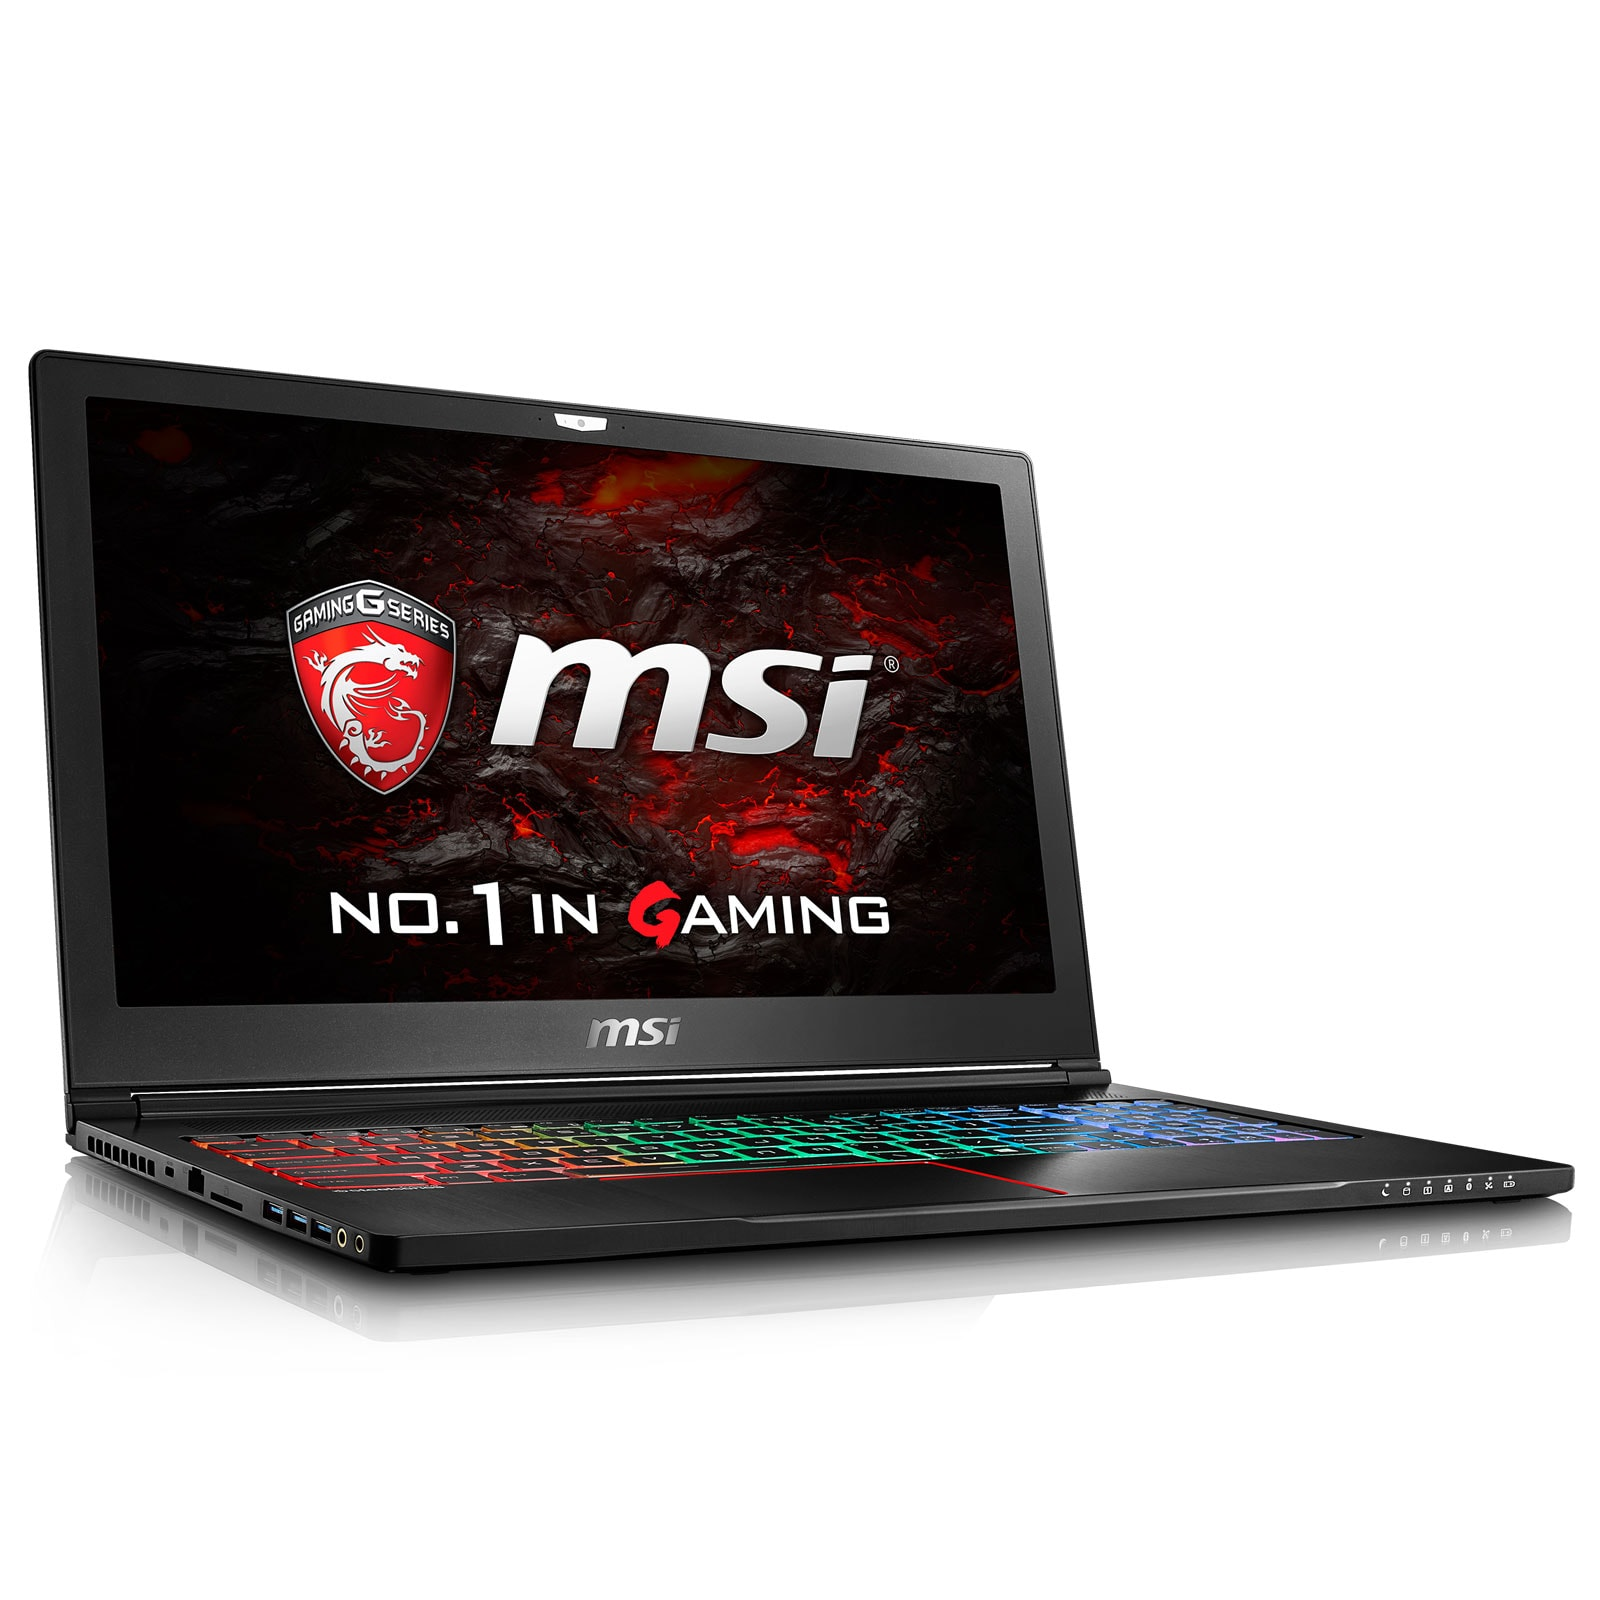 MSI GS63VR 7RG-009FR - PC portable MSI - Cybertek.fr - 0